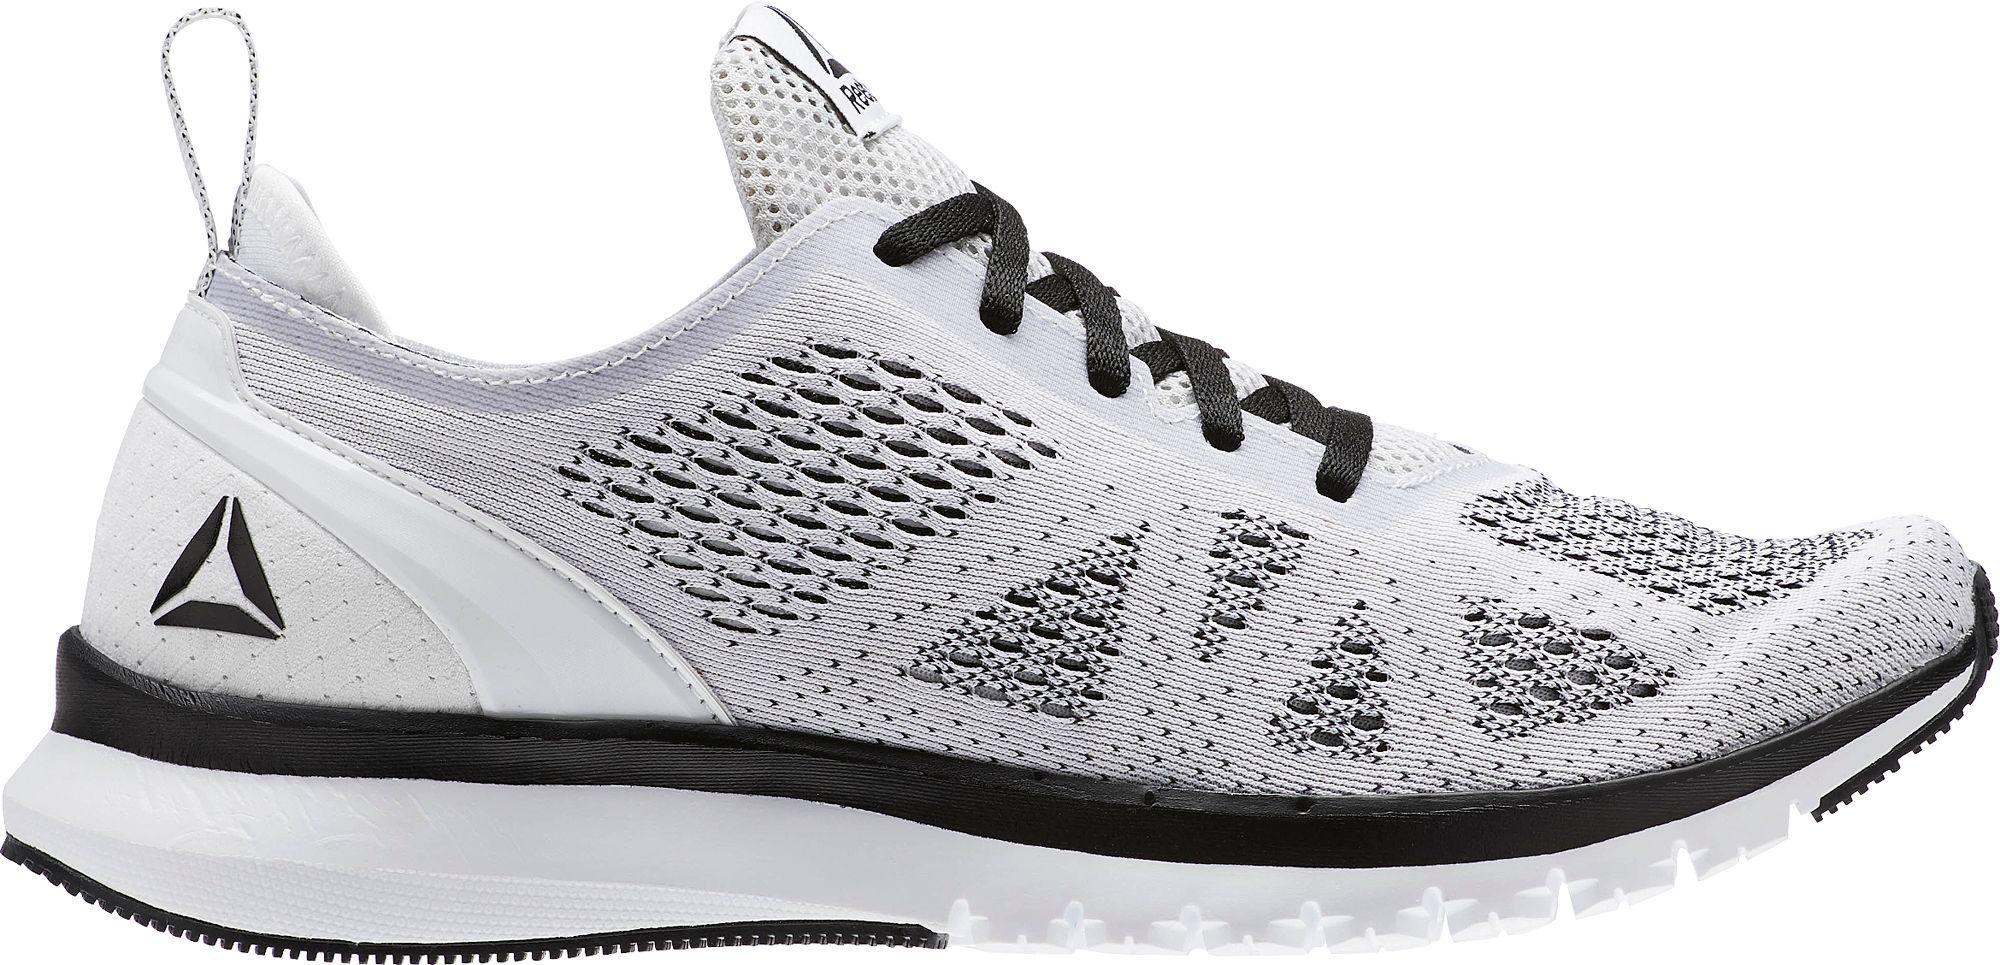 8fecaad1da8116 Lyst - Reebok Print Smooth Clip Ultraknit Running Shoes in Black for Men